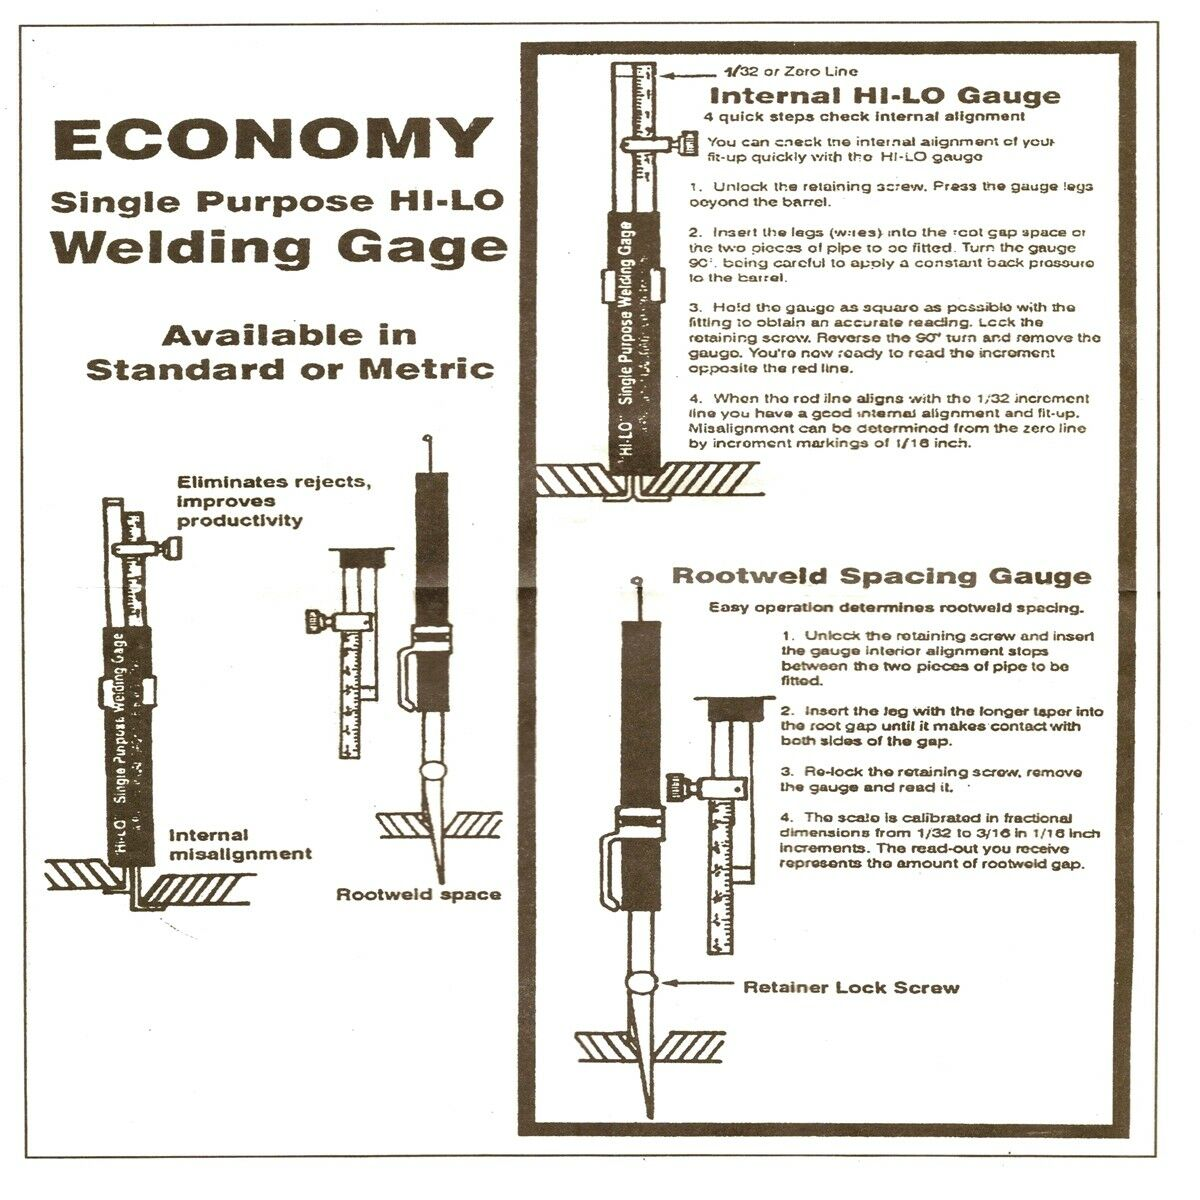 Welding Gauge Hi-Lo Single Purpose Gage Pipe Misalignment Inspection Test